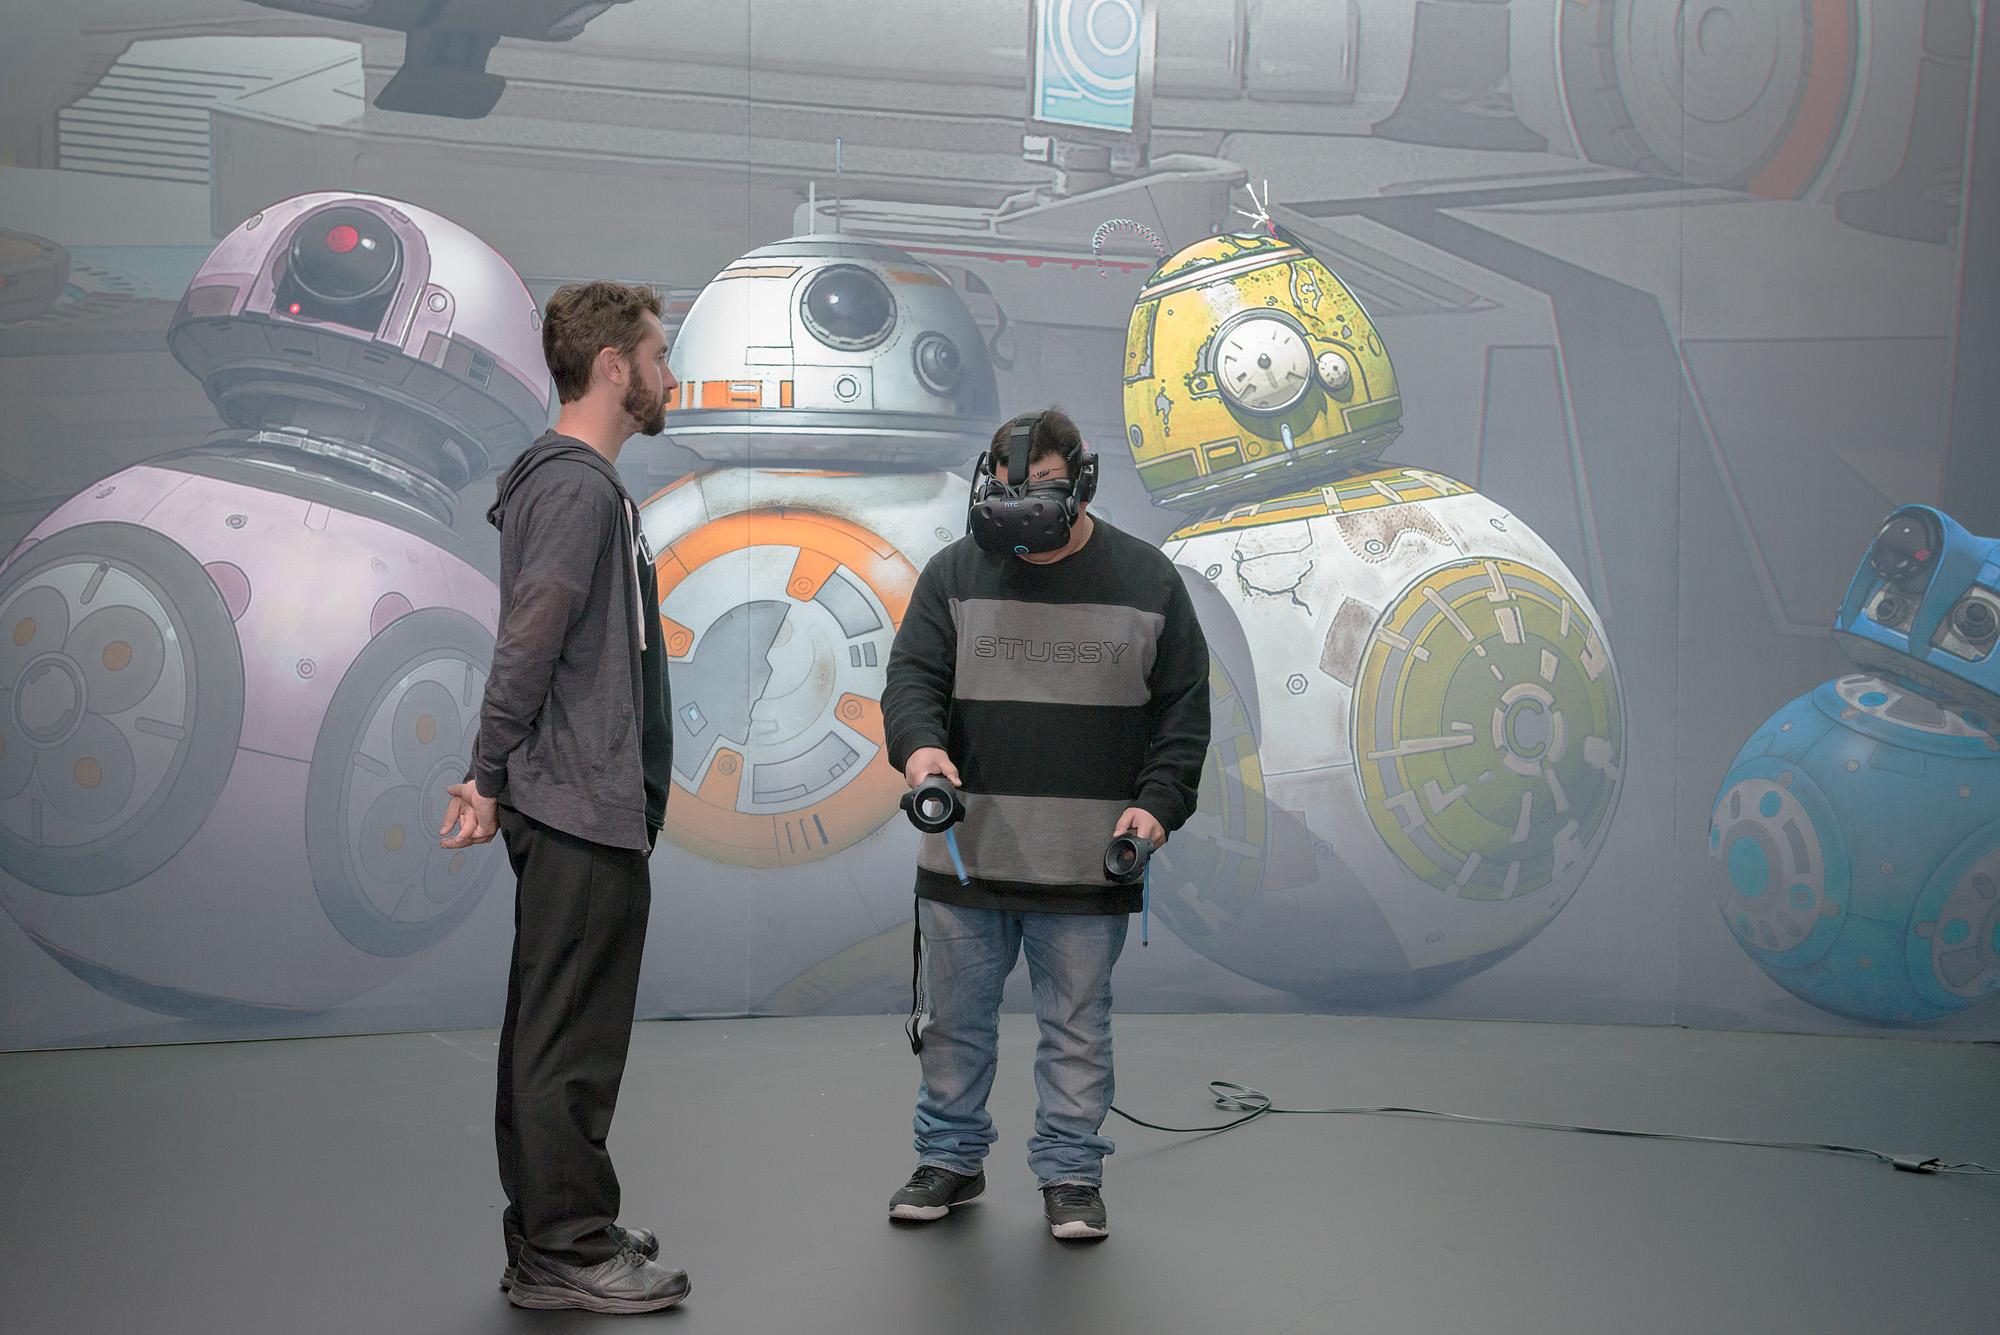 Jedi_VR_Flat.jpg